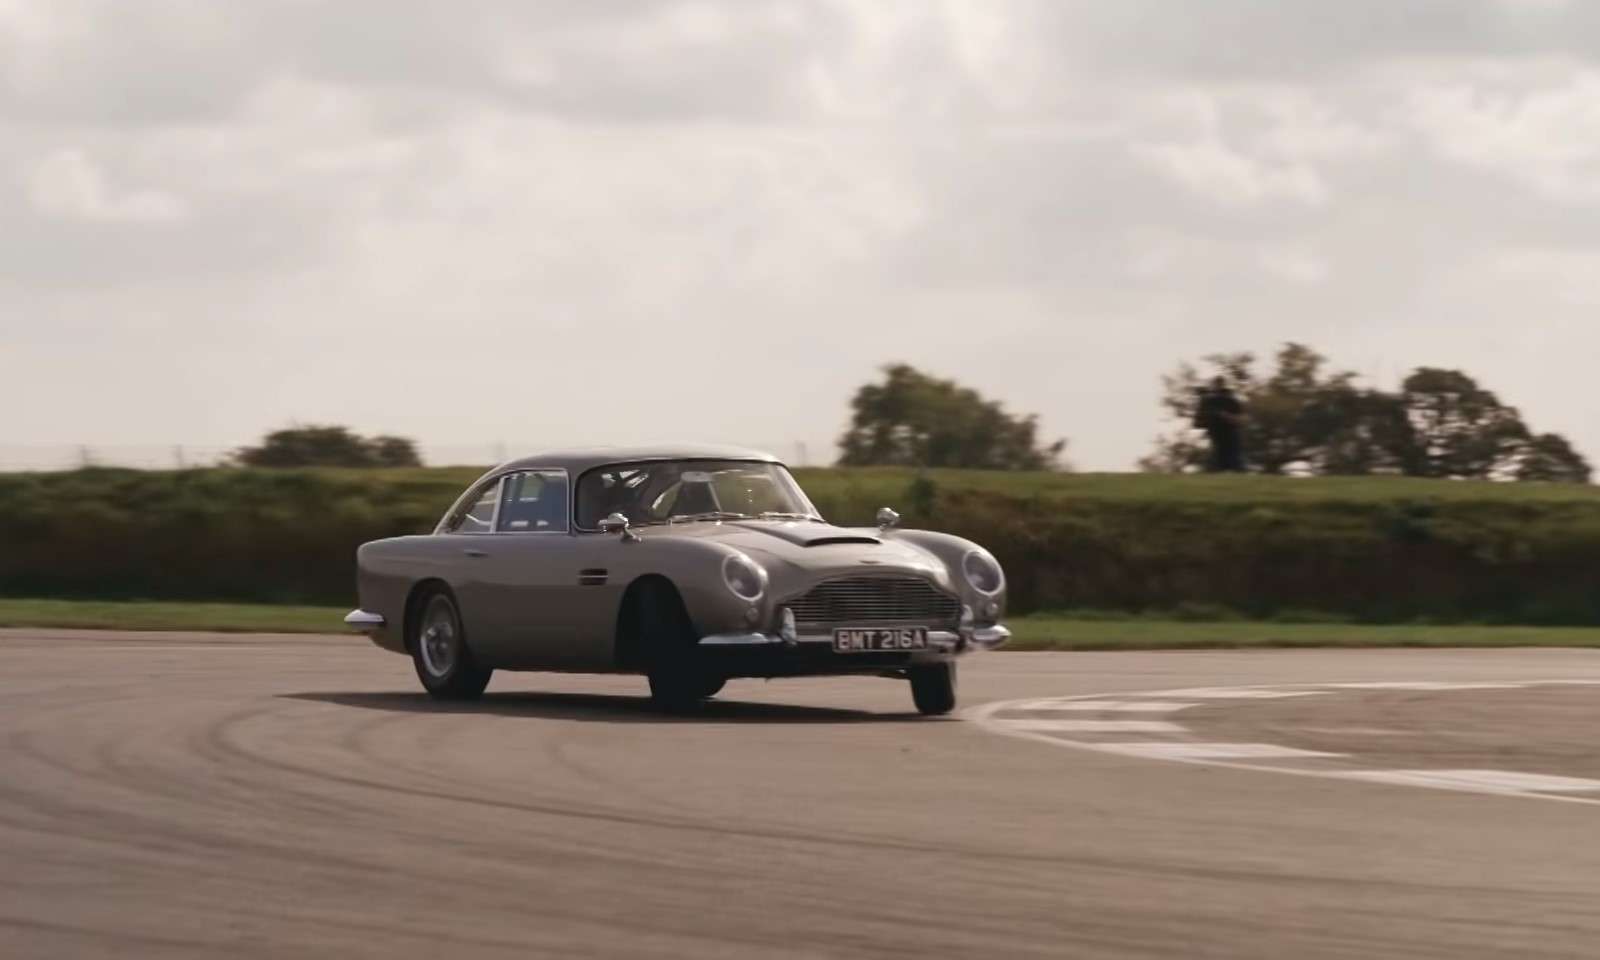 Aston Martin F1 Drivers Channel Their Inner James Bond (3)